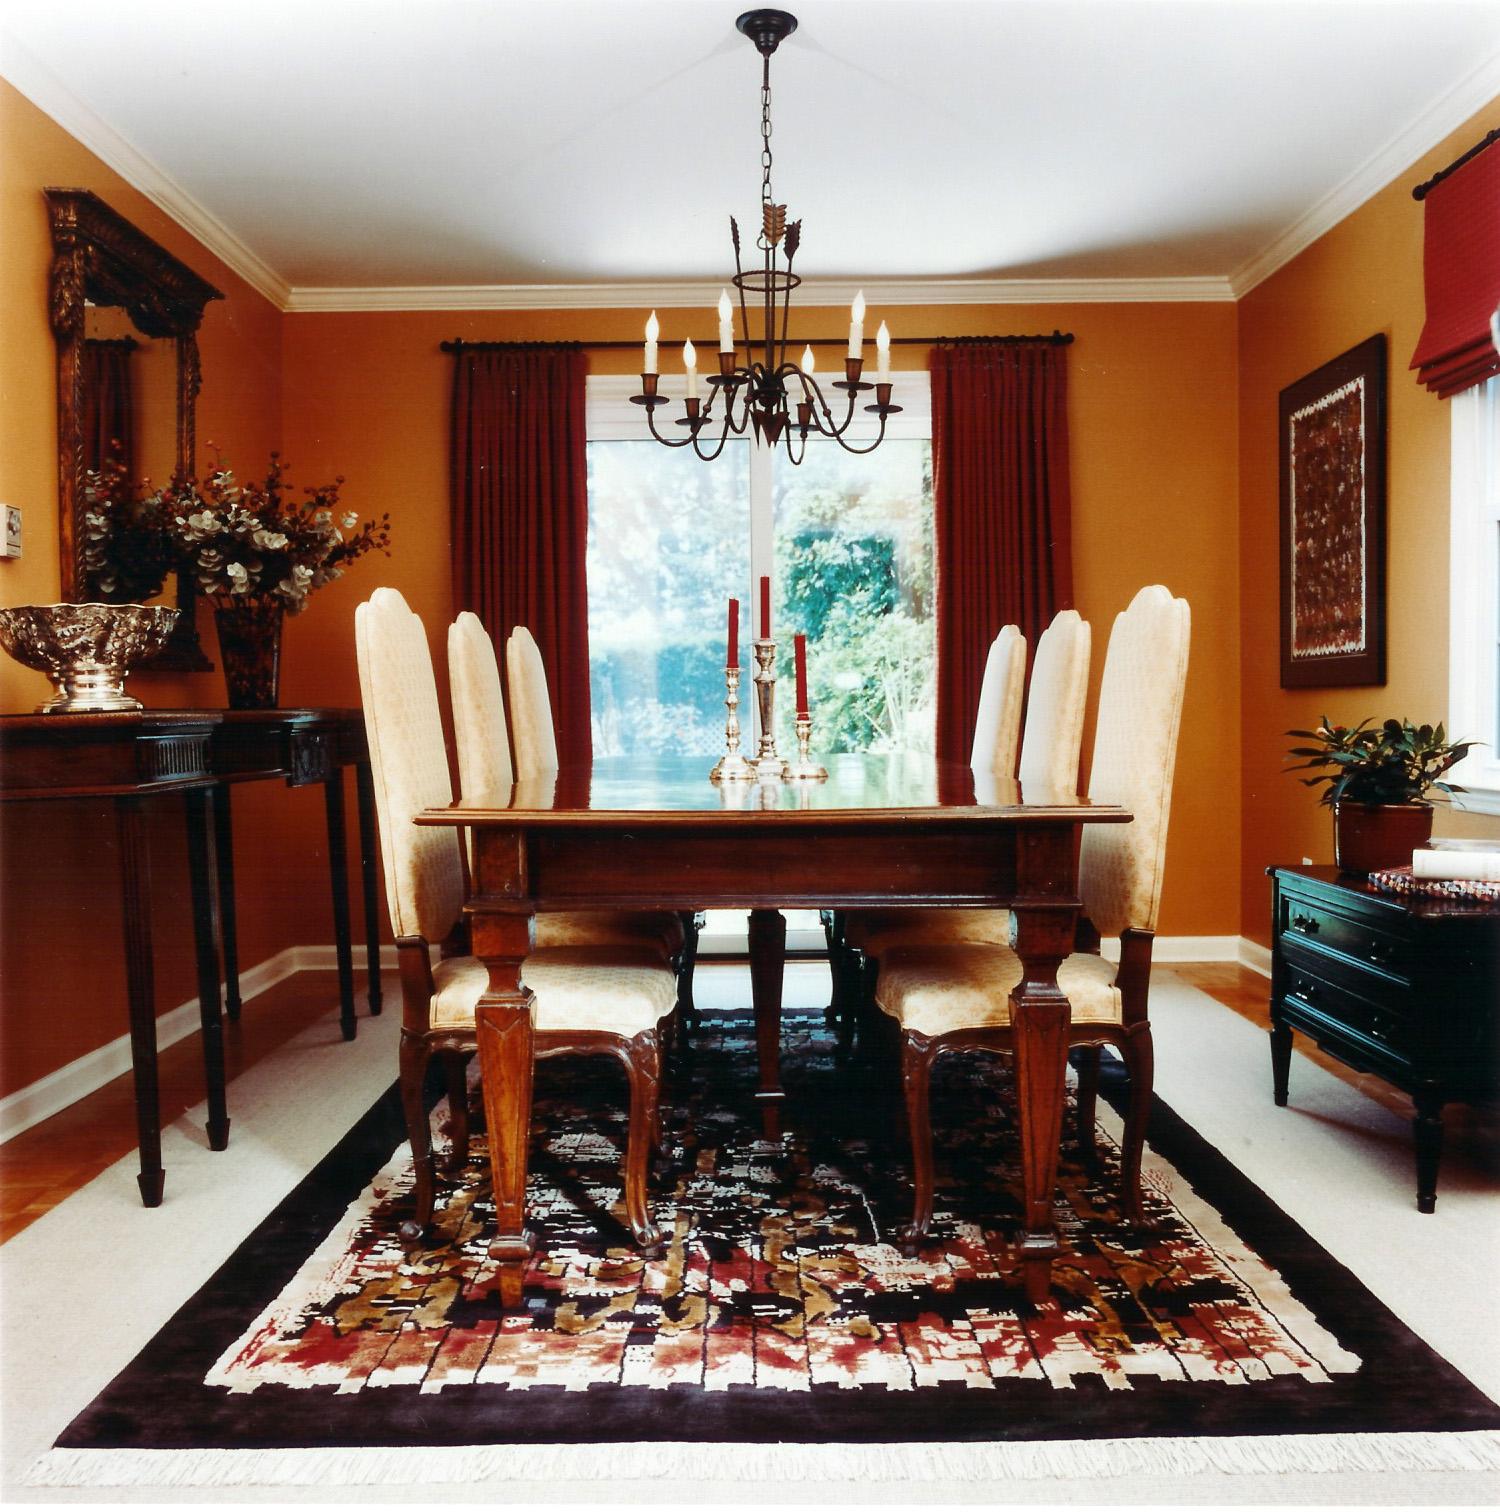 Interior designing home decoration - Dining room rug ideas ...